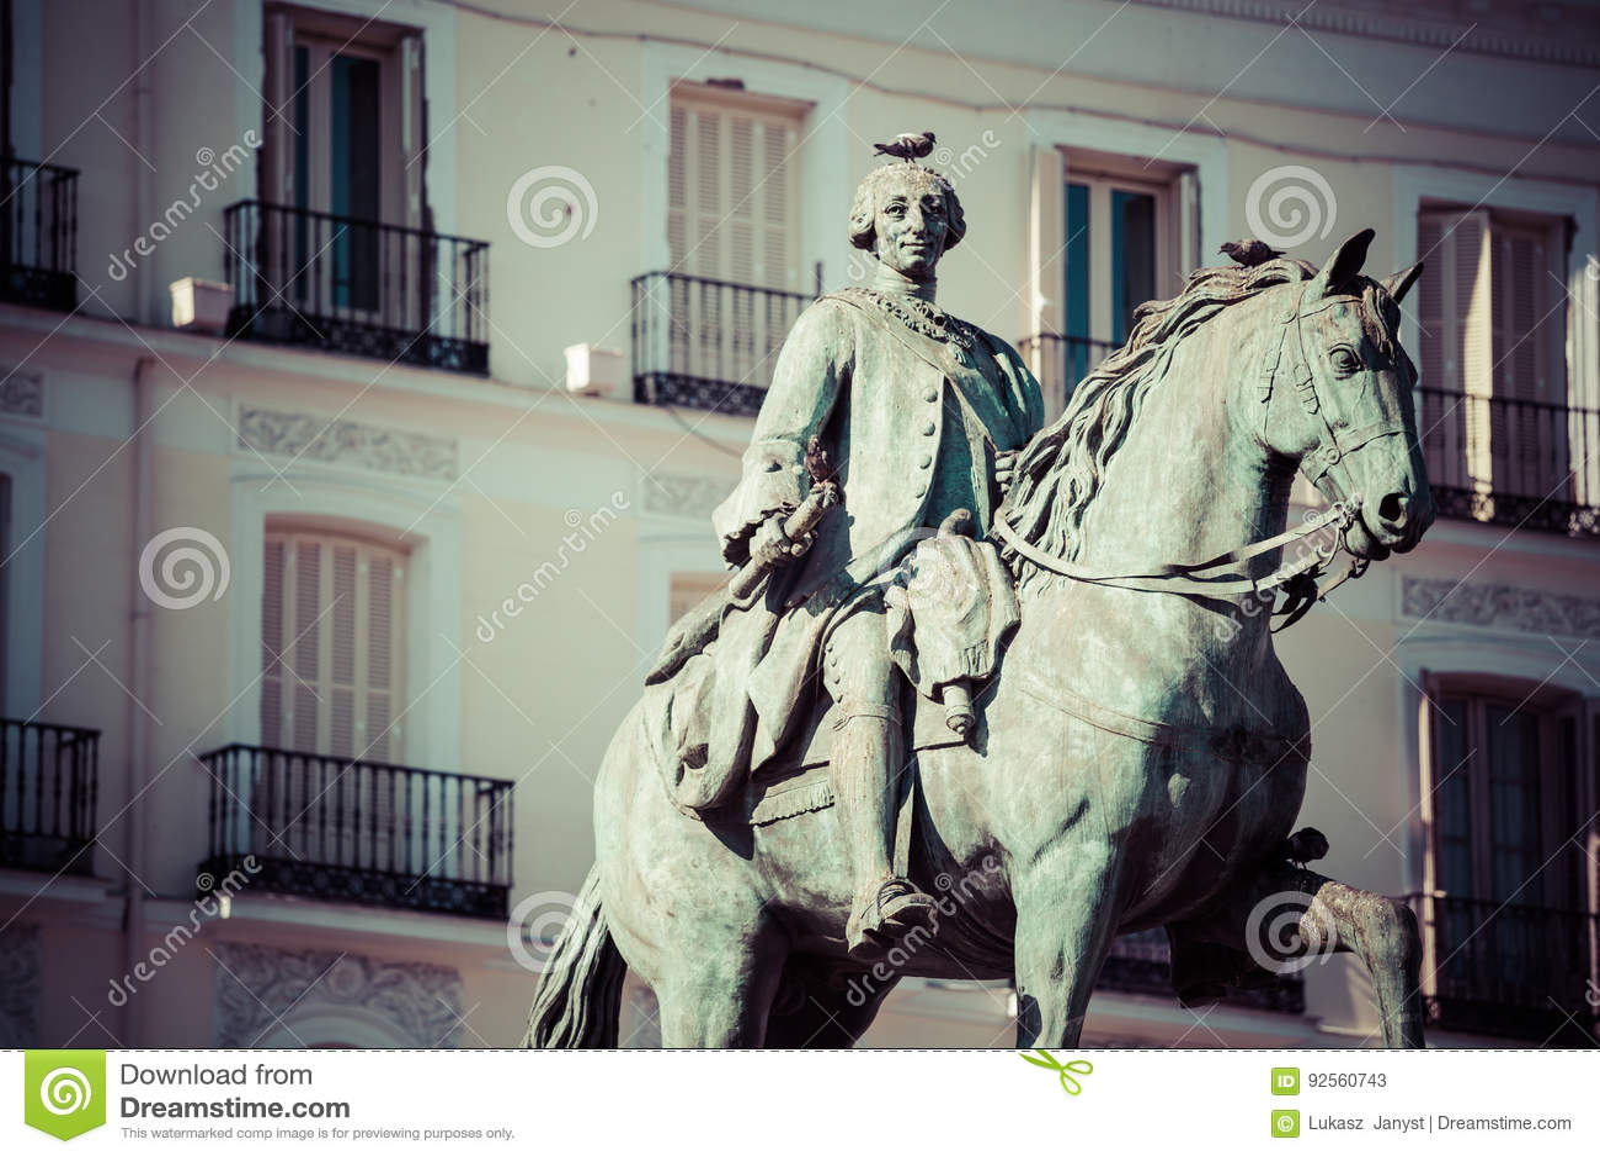 Statua Tio famoso Pepe Sign Puerta de dell equites di re Carlos III